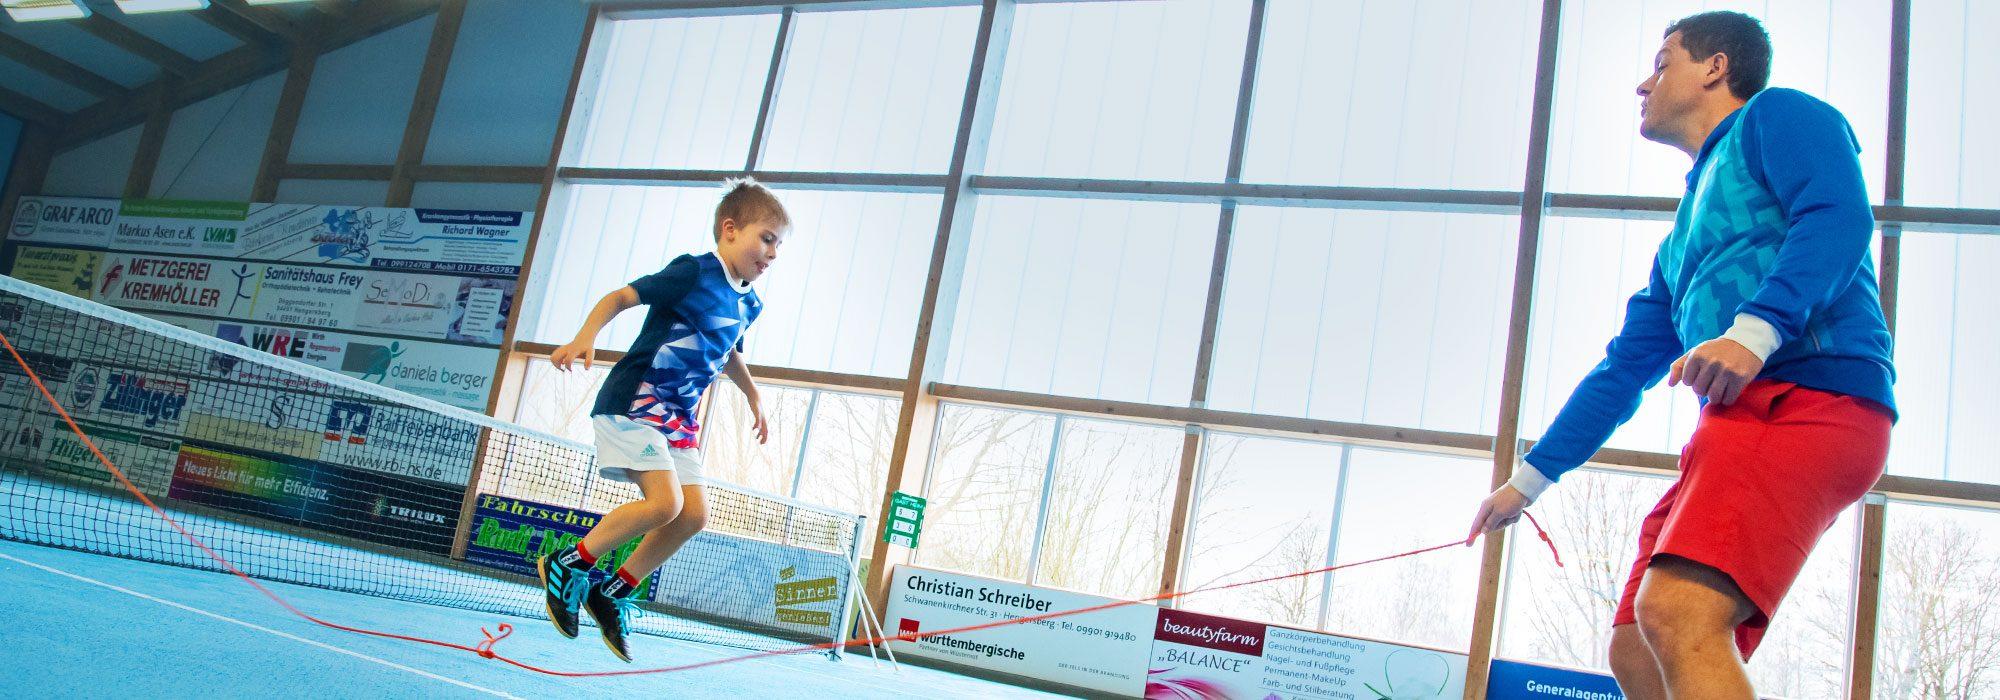 Datenschutz | Tennisschule Raimund Knogler